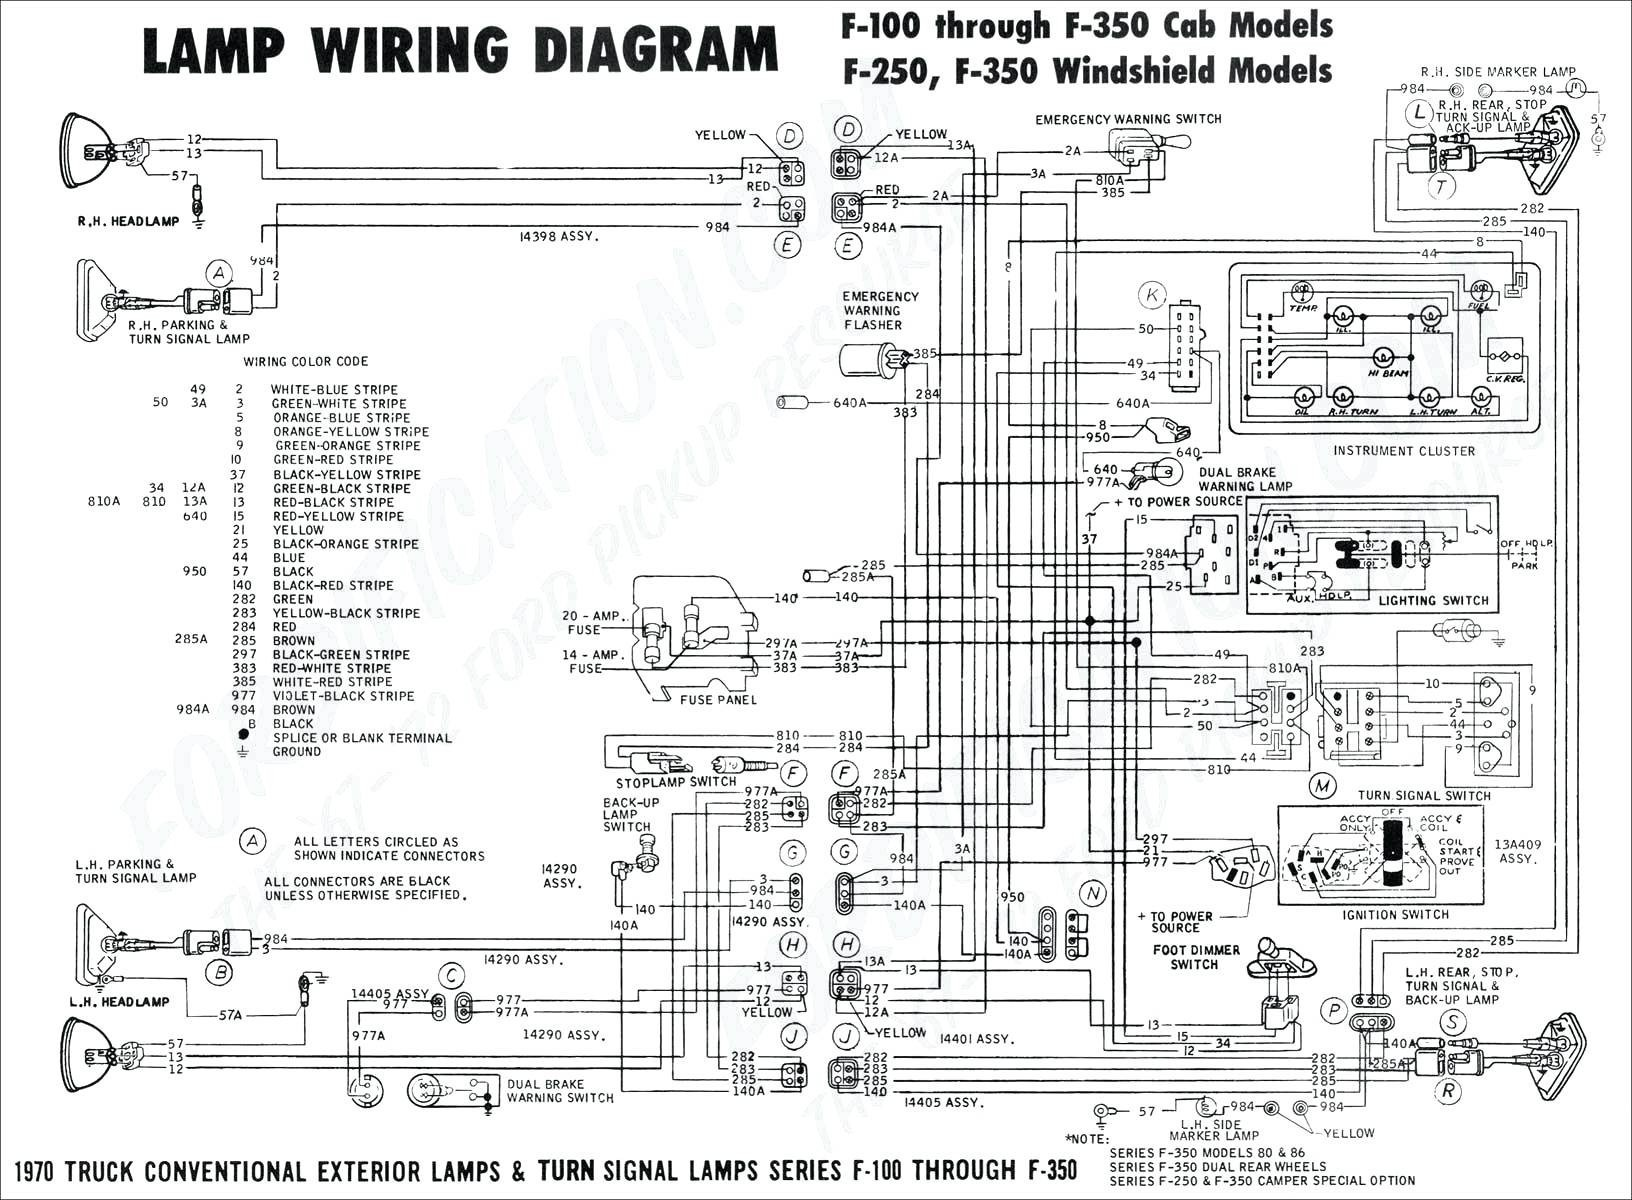 2007 ford Fusion Engine Diagram 07 F250 Wiring Diagram Another Blog About Wiring Diagram • Of 2007 ford Fusion Engine Diagram